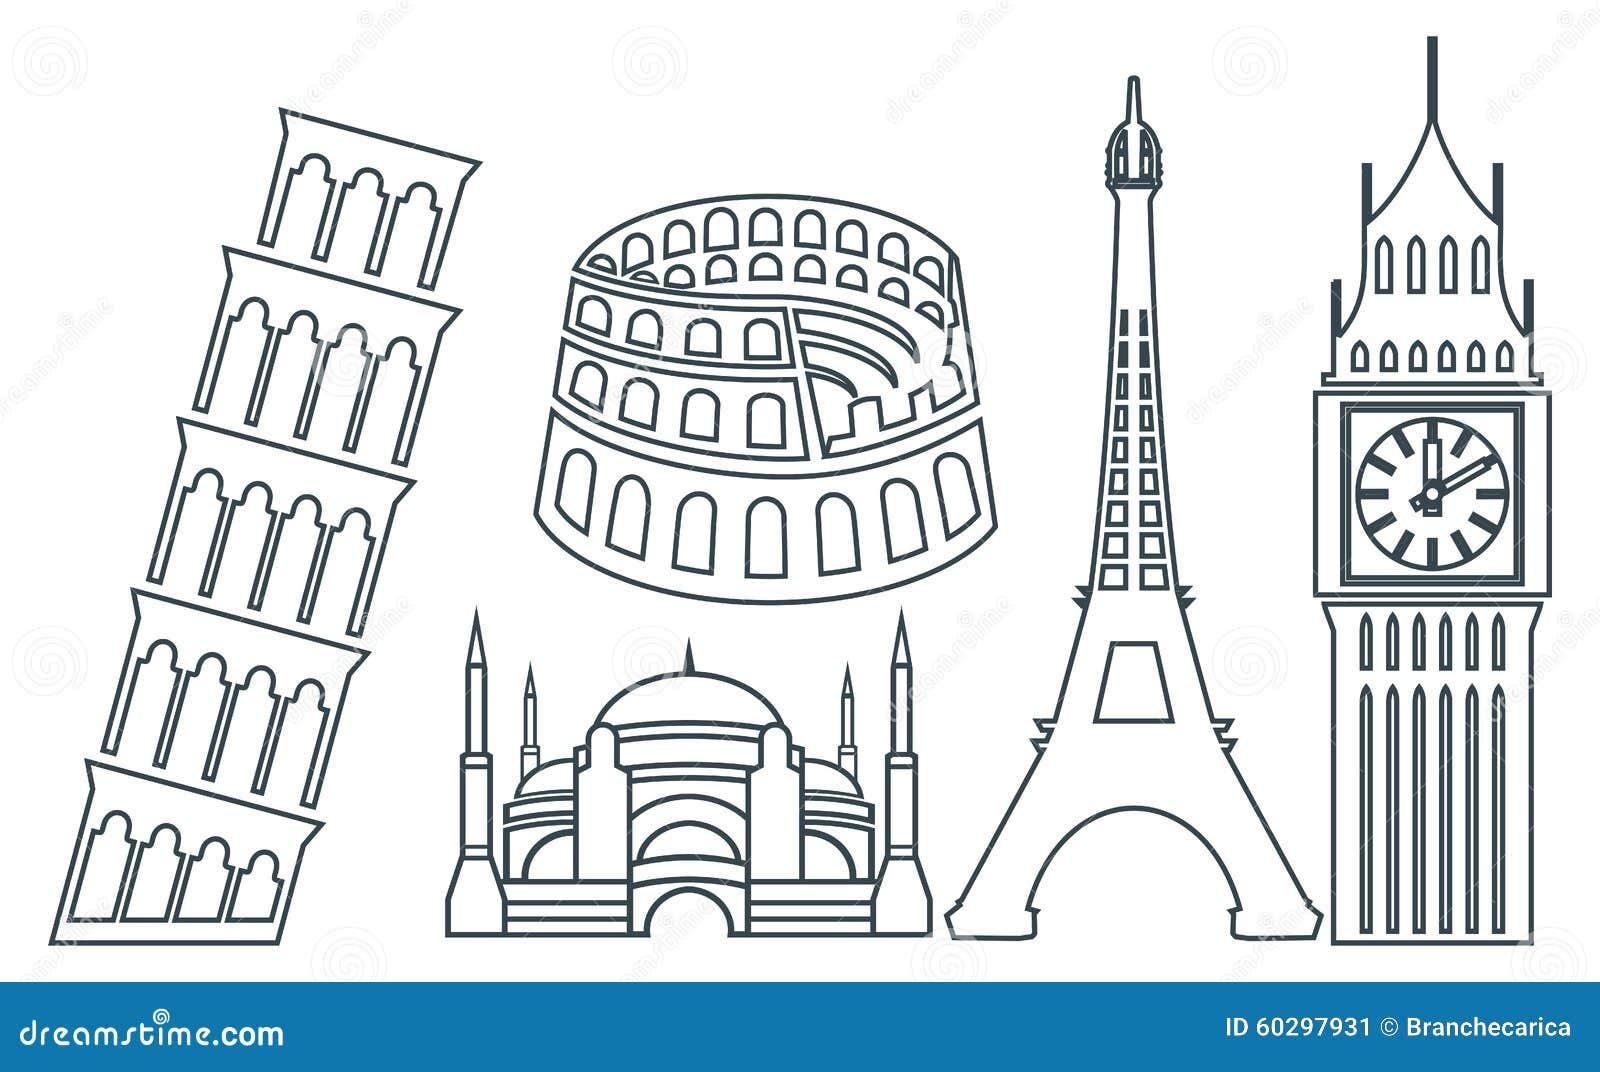 world famous buildings icons stock illustration image Colosseum Cartoon colosseum rome clipart